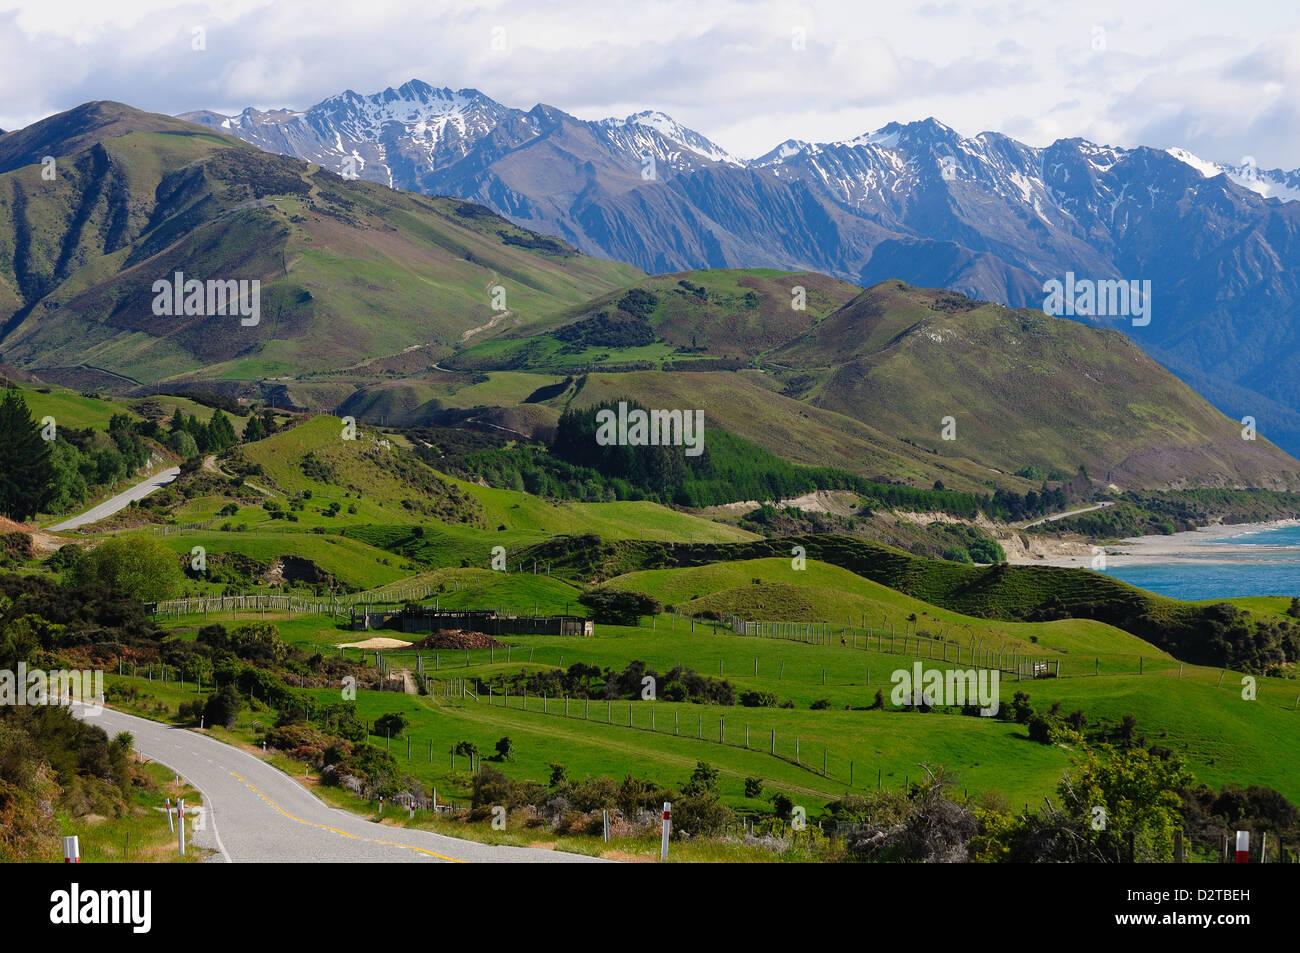 Highway to Milford Sound via Lake Tena Vu, South Island, New Zealand, Pacific - Stock Image